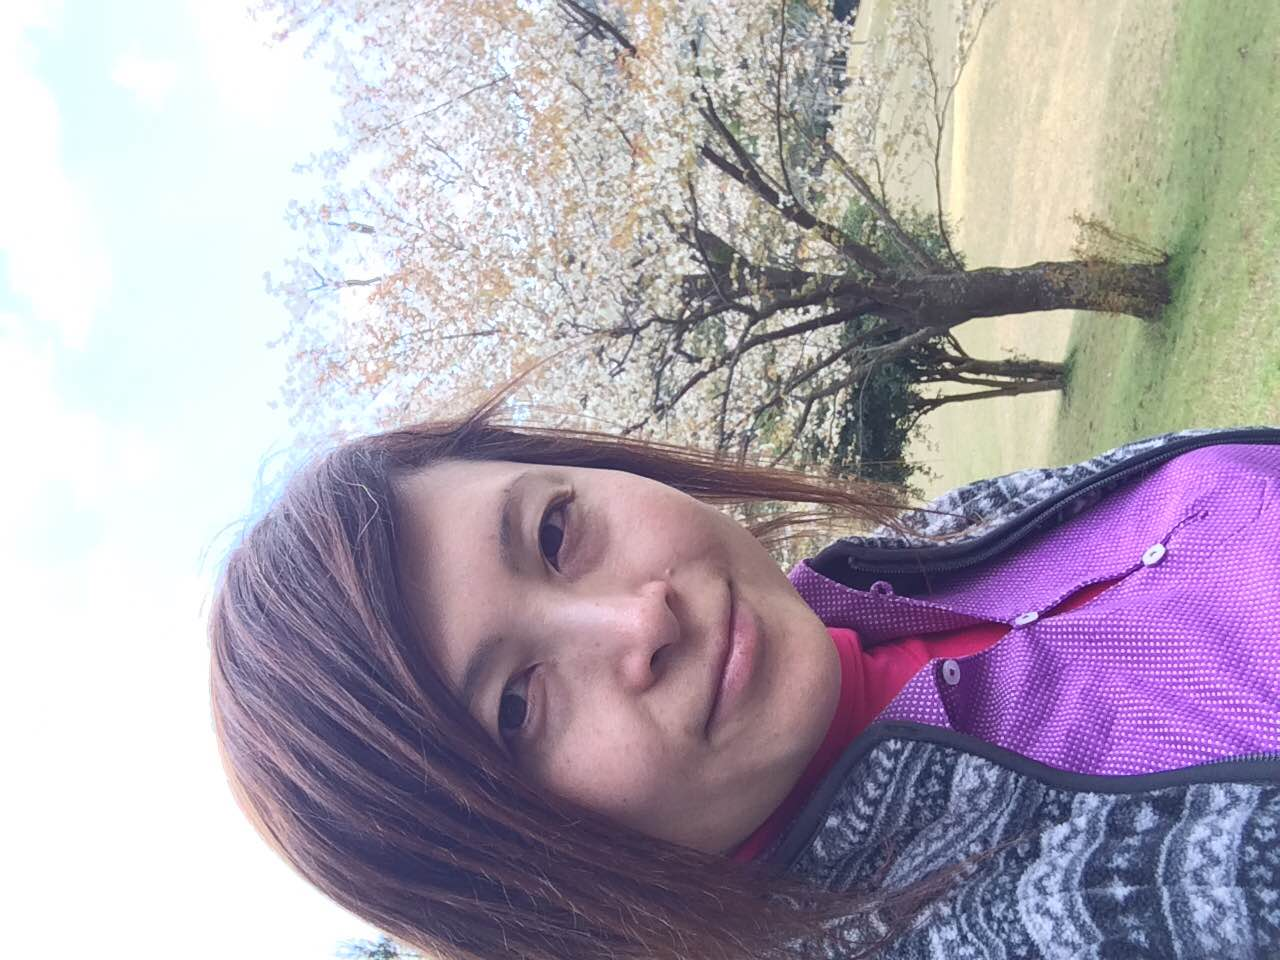 1/2015032508481204-IMG_2885-small.jpg